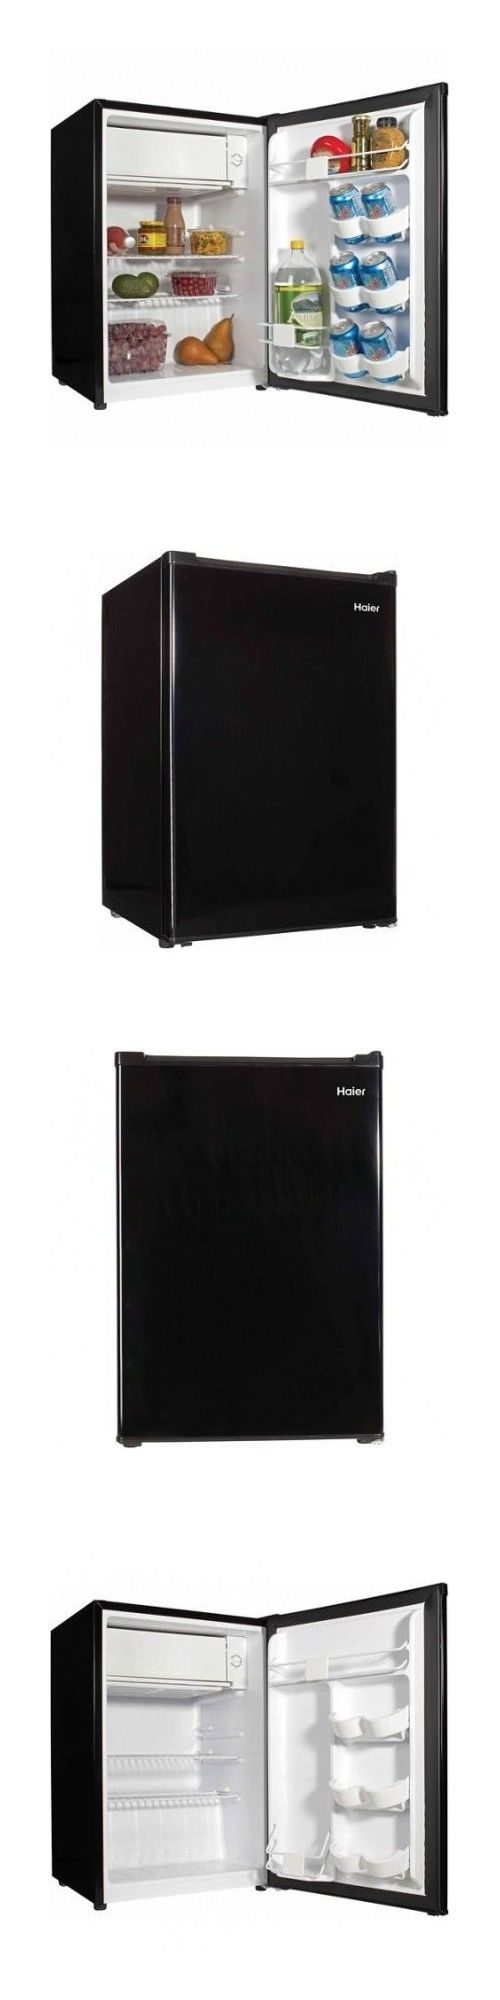 Mini Fridges 71262: Compact Dorm Fridge Freezer Black Mini Refrigerator Home Office Den Beer Cooler -> BUY IT NOW ONLY: $102.95 on eBay!